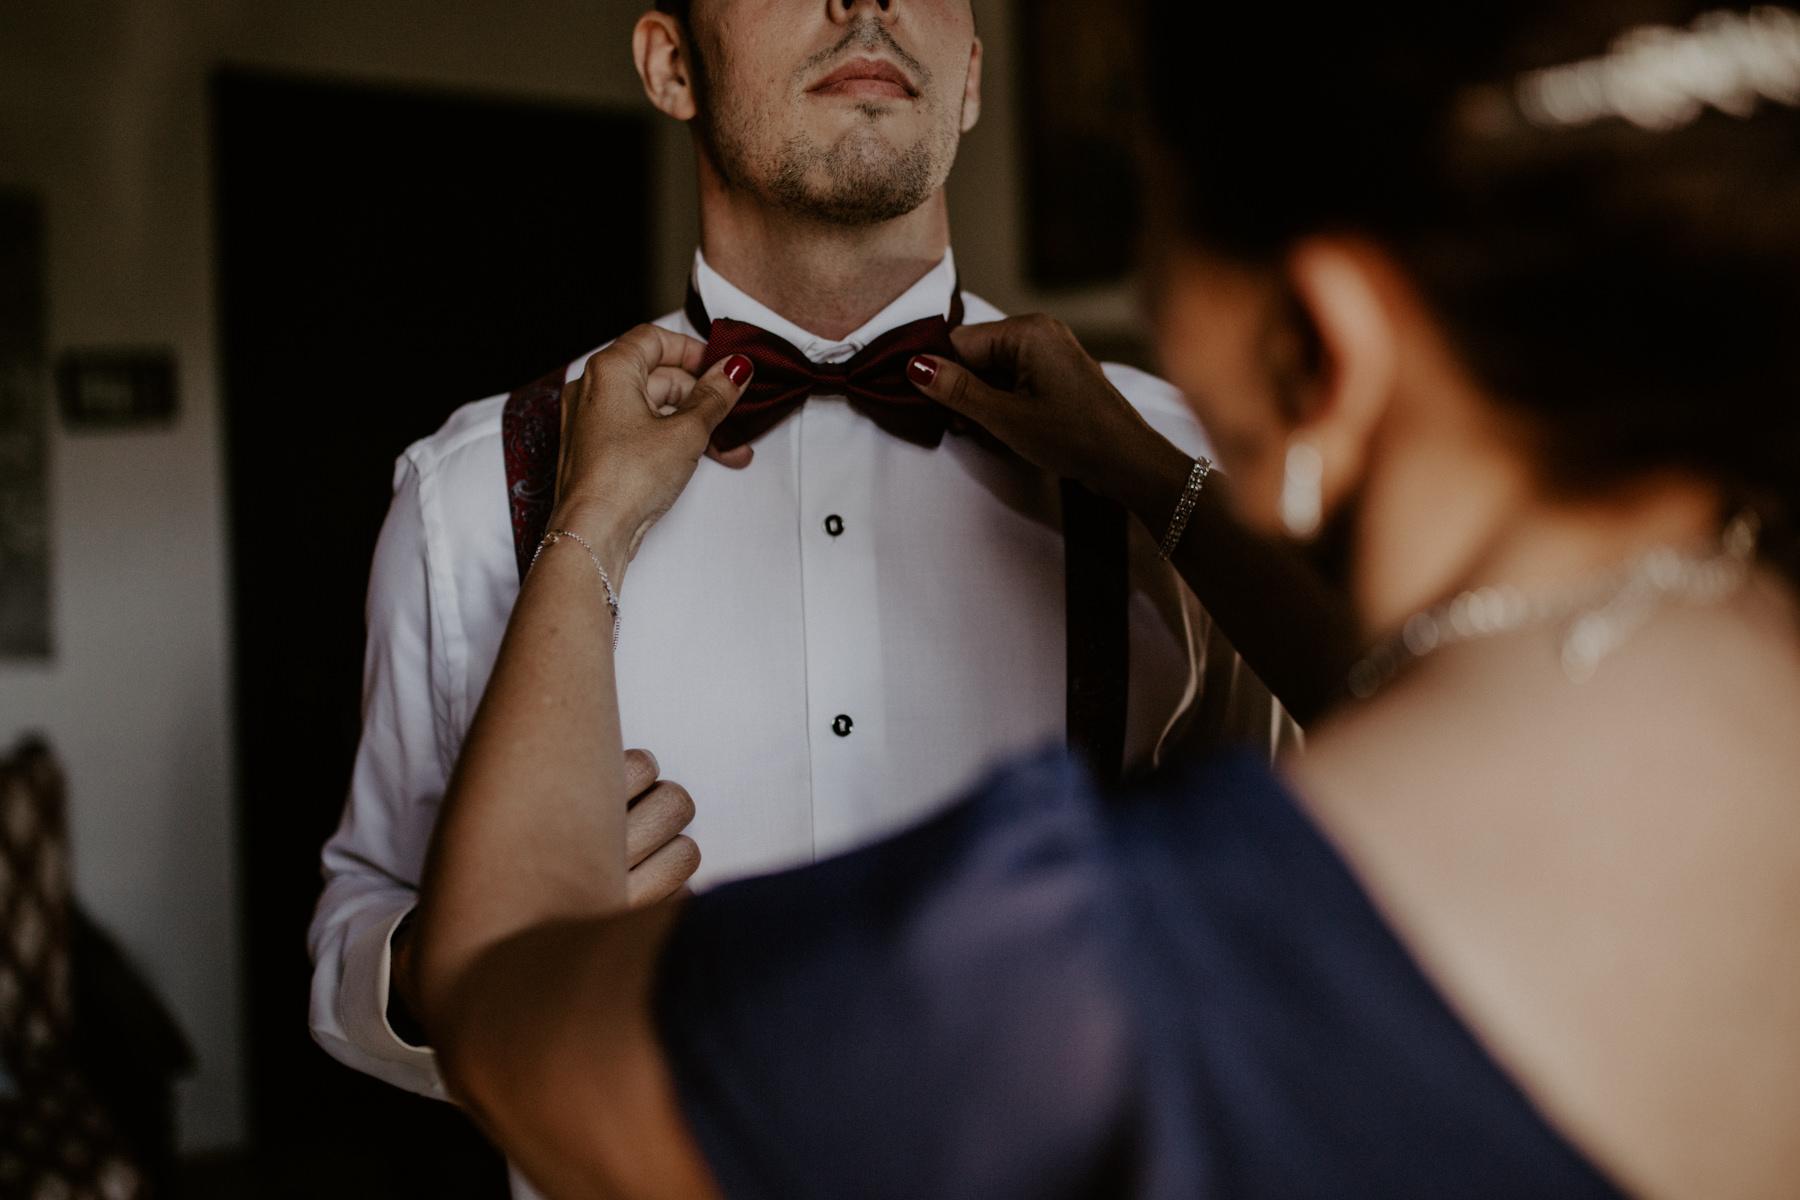 alt_thenortherngirlphotography_couples_weddingphotographer_photographer_wedding_boda_fotografodebodas_fotografobodasbarcelona_bodaindie_bodasconestilo_bodaensantperedeclara_jennifermiguel-132.jpg